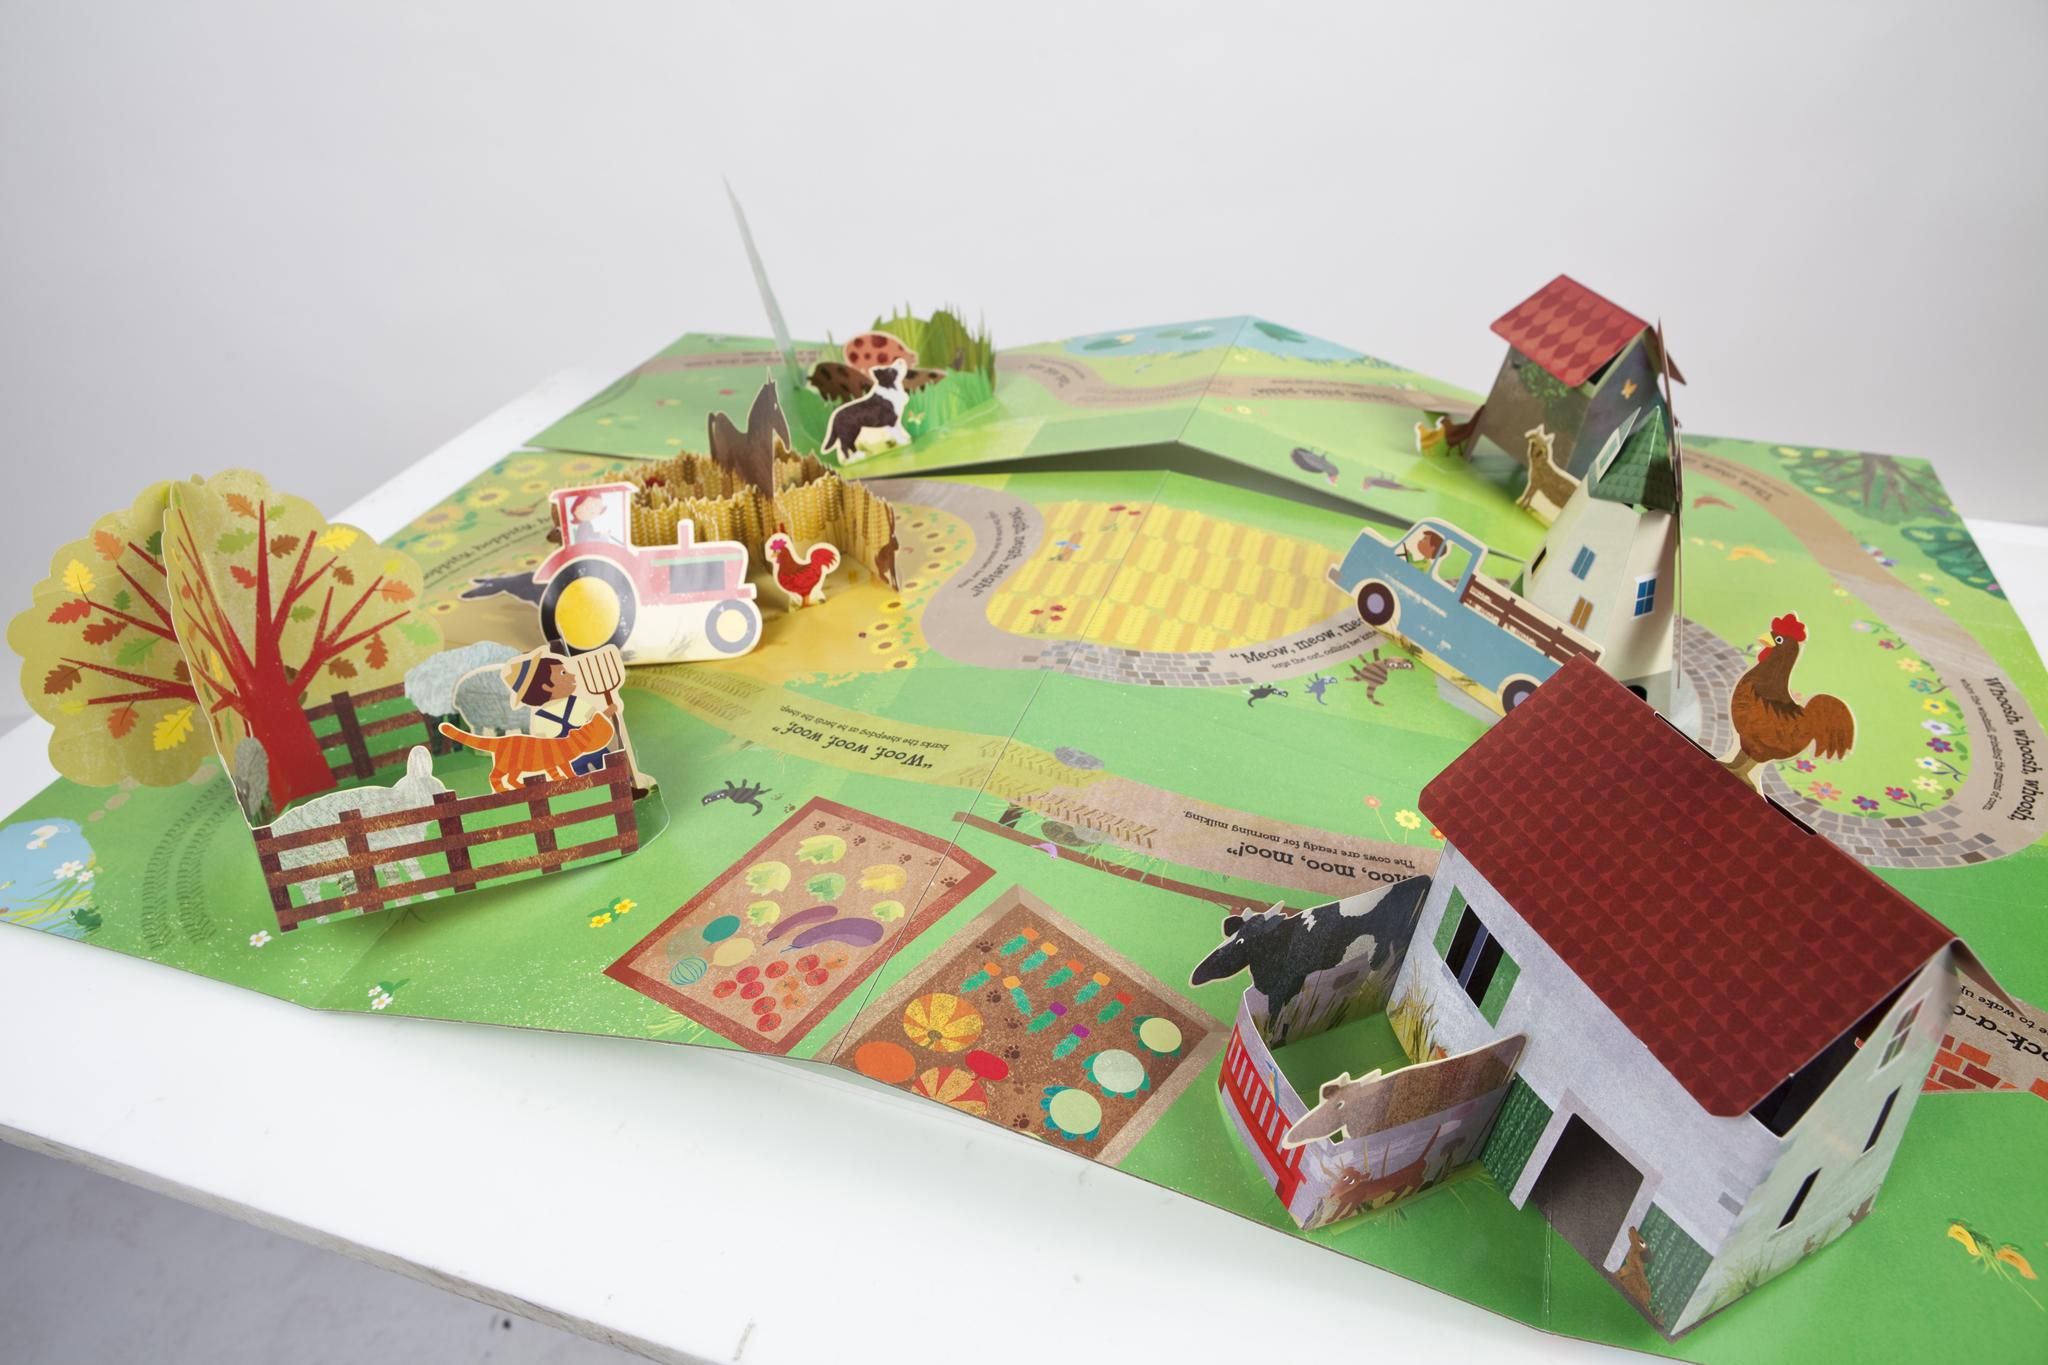 Playbook Farm by Cornia Fletcher and Britta Teckentrup